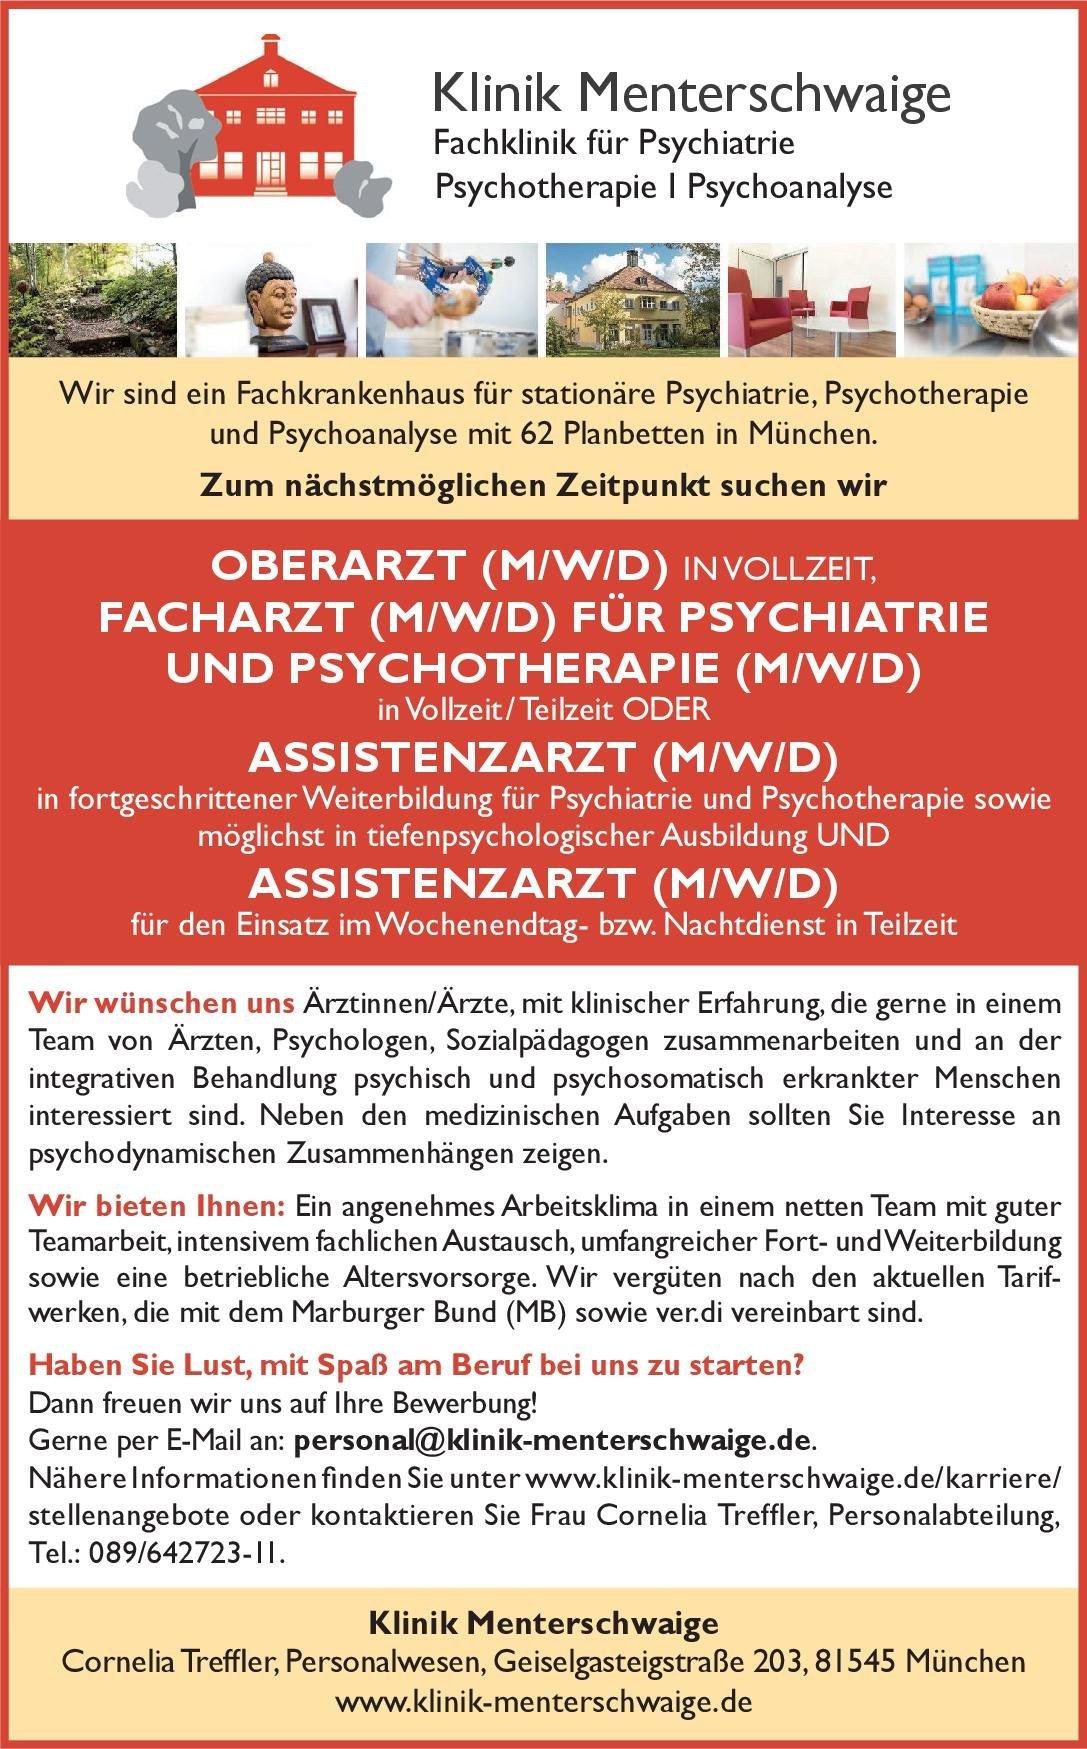 Klinik Menterschwaige Oberarzt (m/w/d) in Vollzeit  Psychiatrie und Psychotherapie, Psychiatrie und Psychotherapie Oberarzt